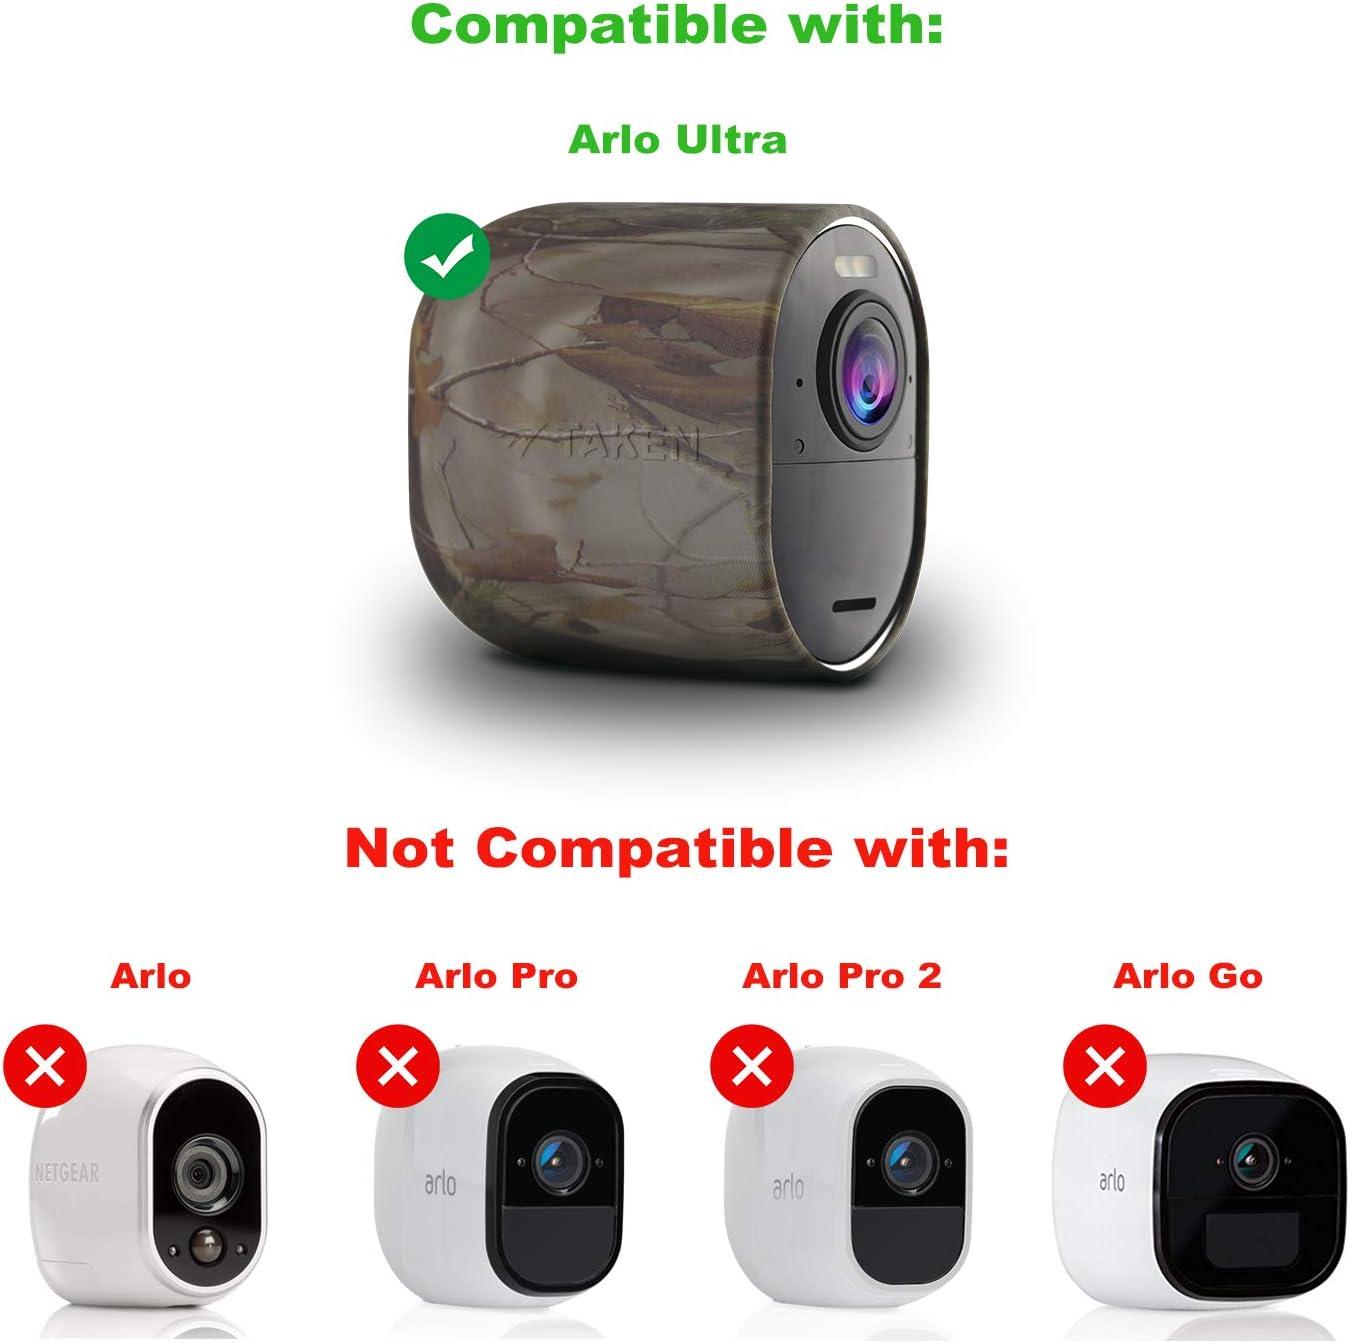 Arlo Ultra Skin Taken Schutzhülle Aus Silikon Kompatibel Mit Arlo Ultra Kamera Langlebig Und Wetterfest 2 Stück Camouflage Elektronik